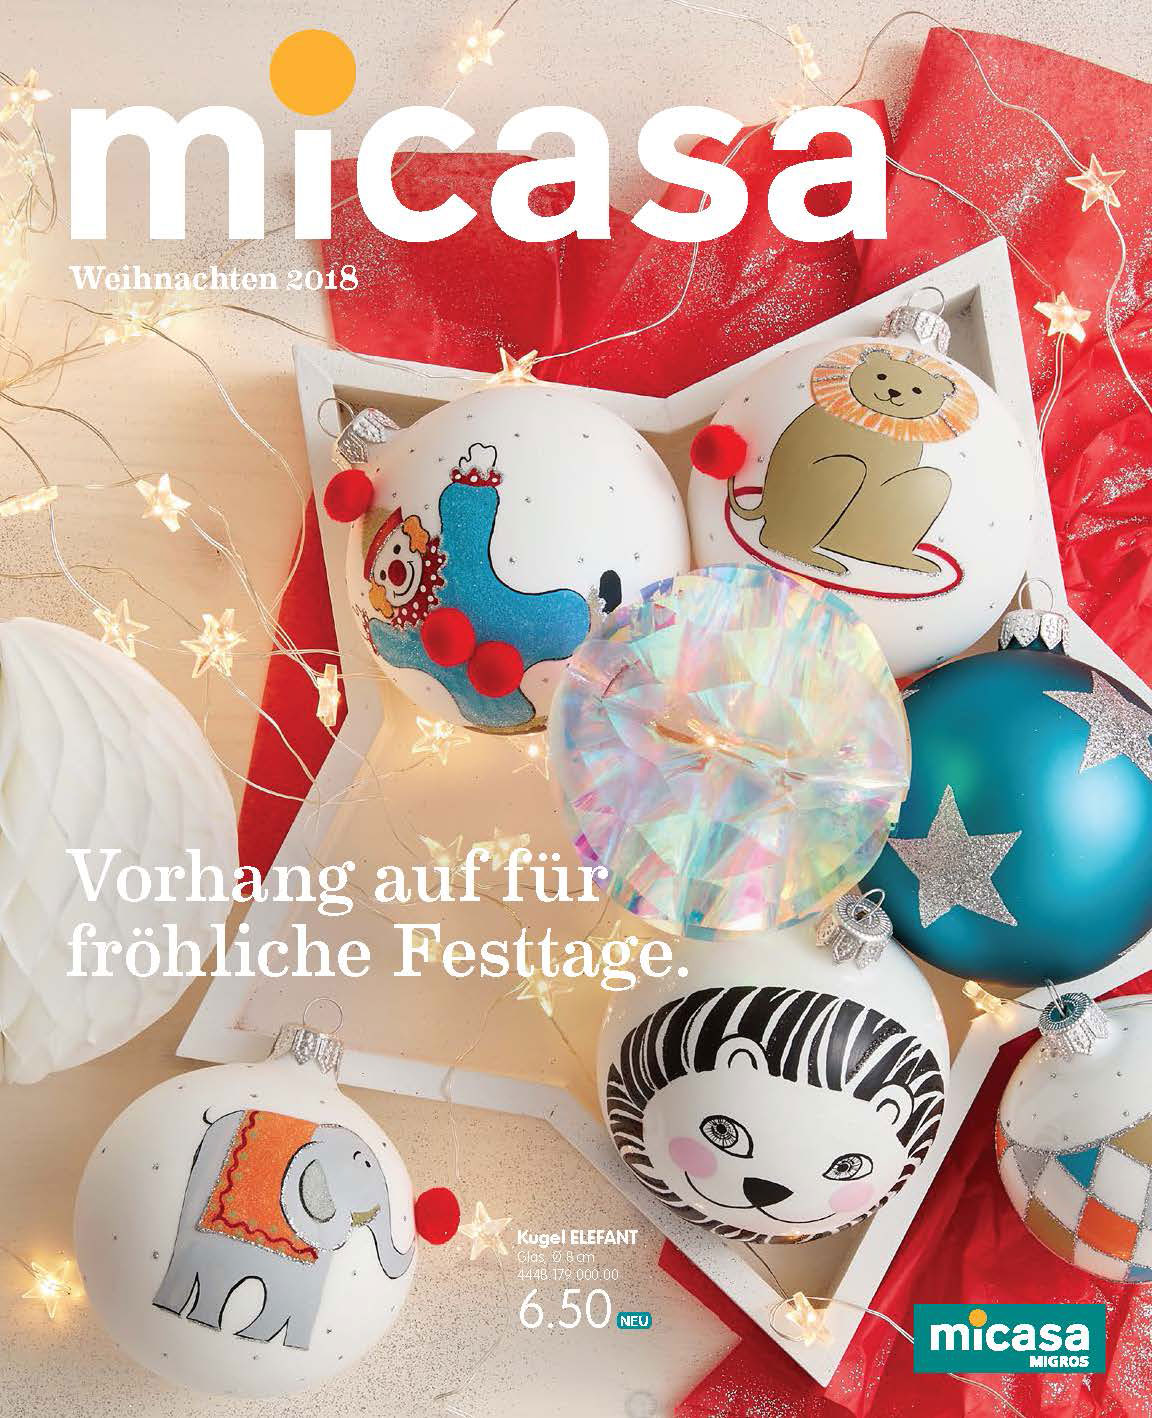 Micasa Christmas 2018